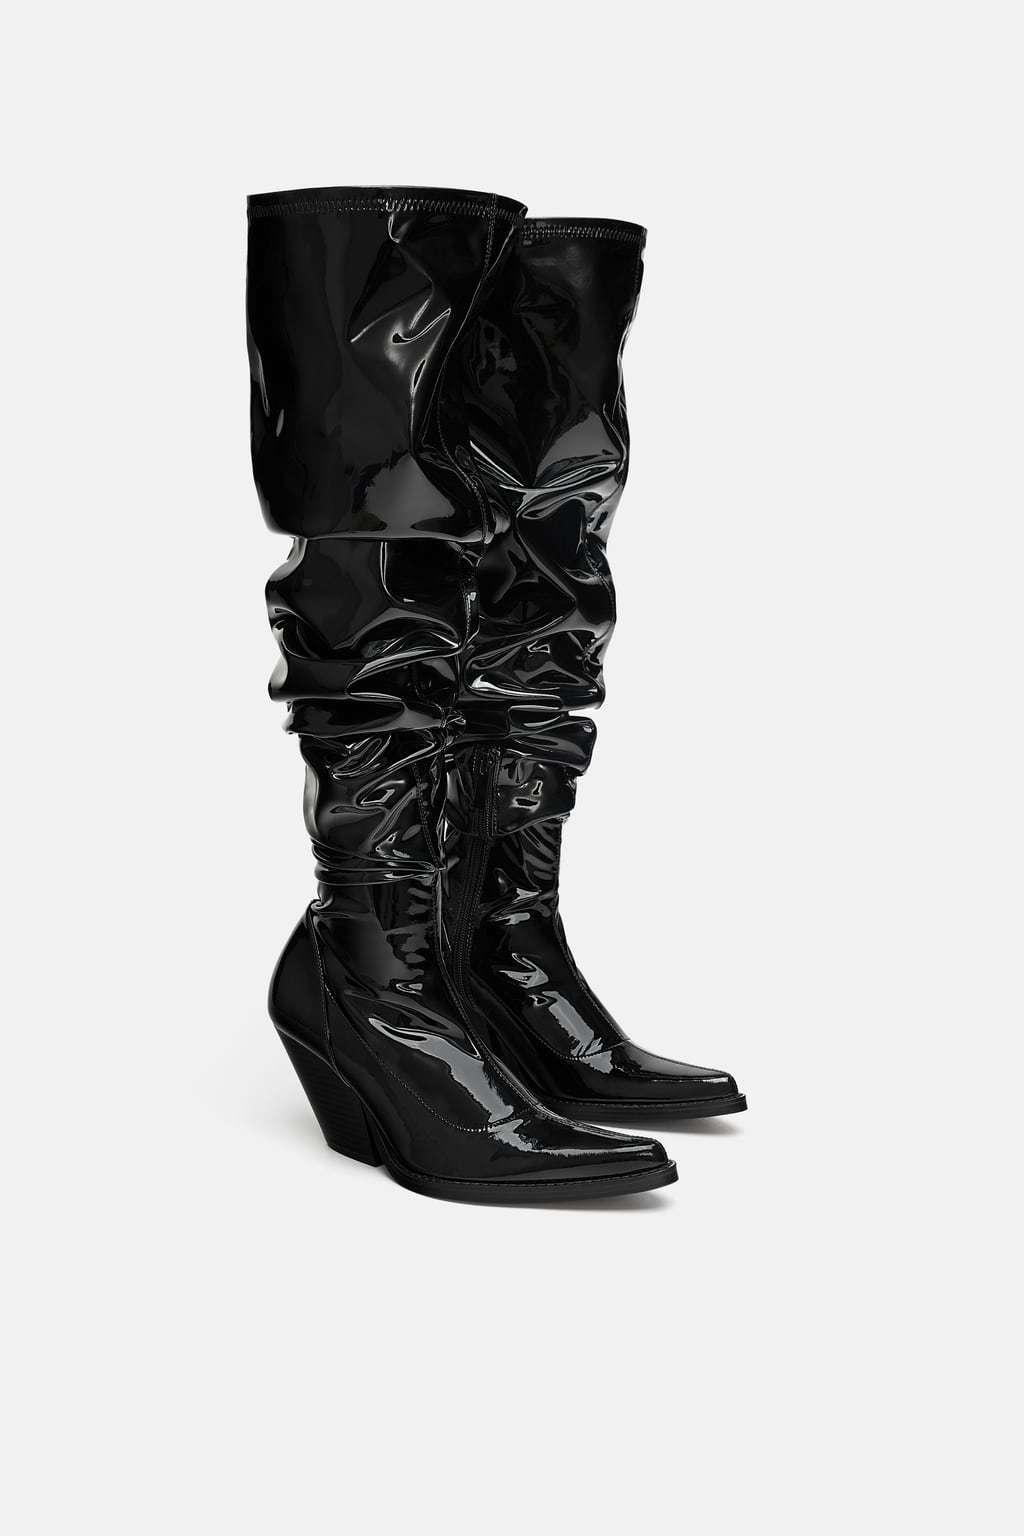 Zara nuevo AW18 AW18 AW18 XL botas De Vaquero Imitación Patente acabado negro todas las tallas ref. 7004 301 8f8c09